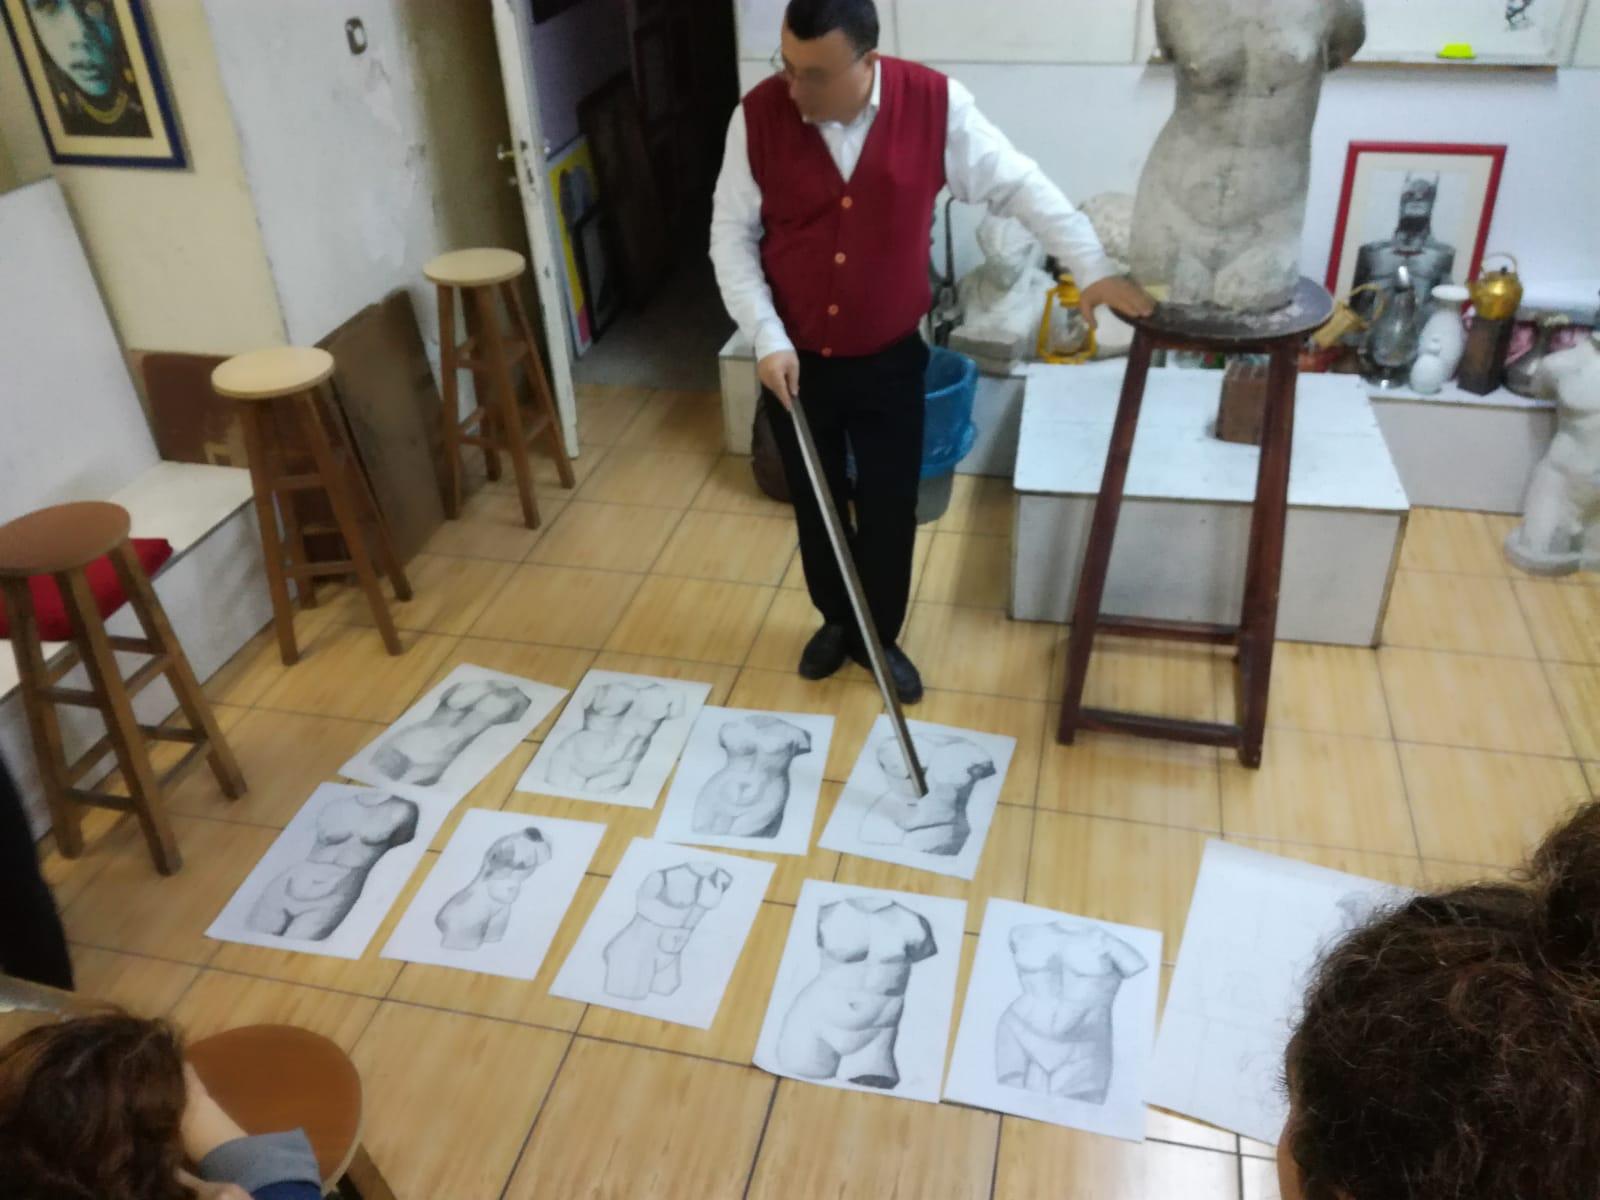 Ücretsiz Resim Kursları Ankara